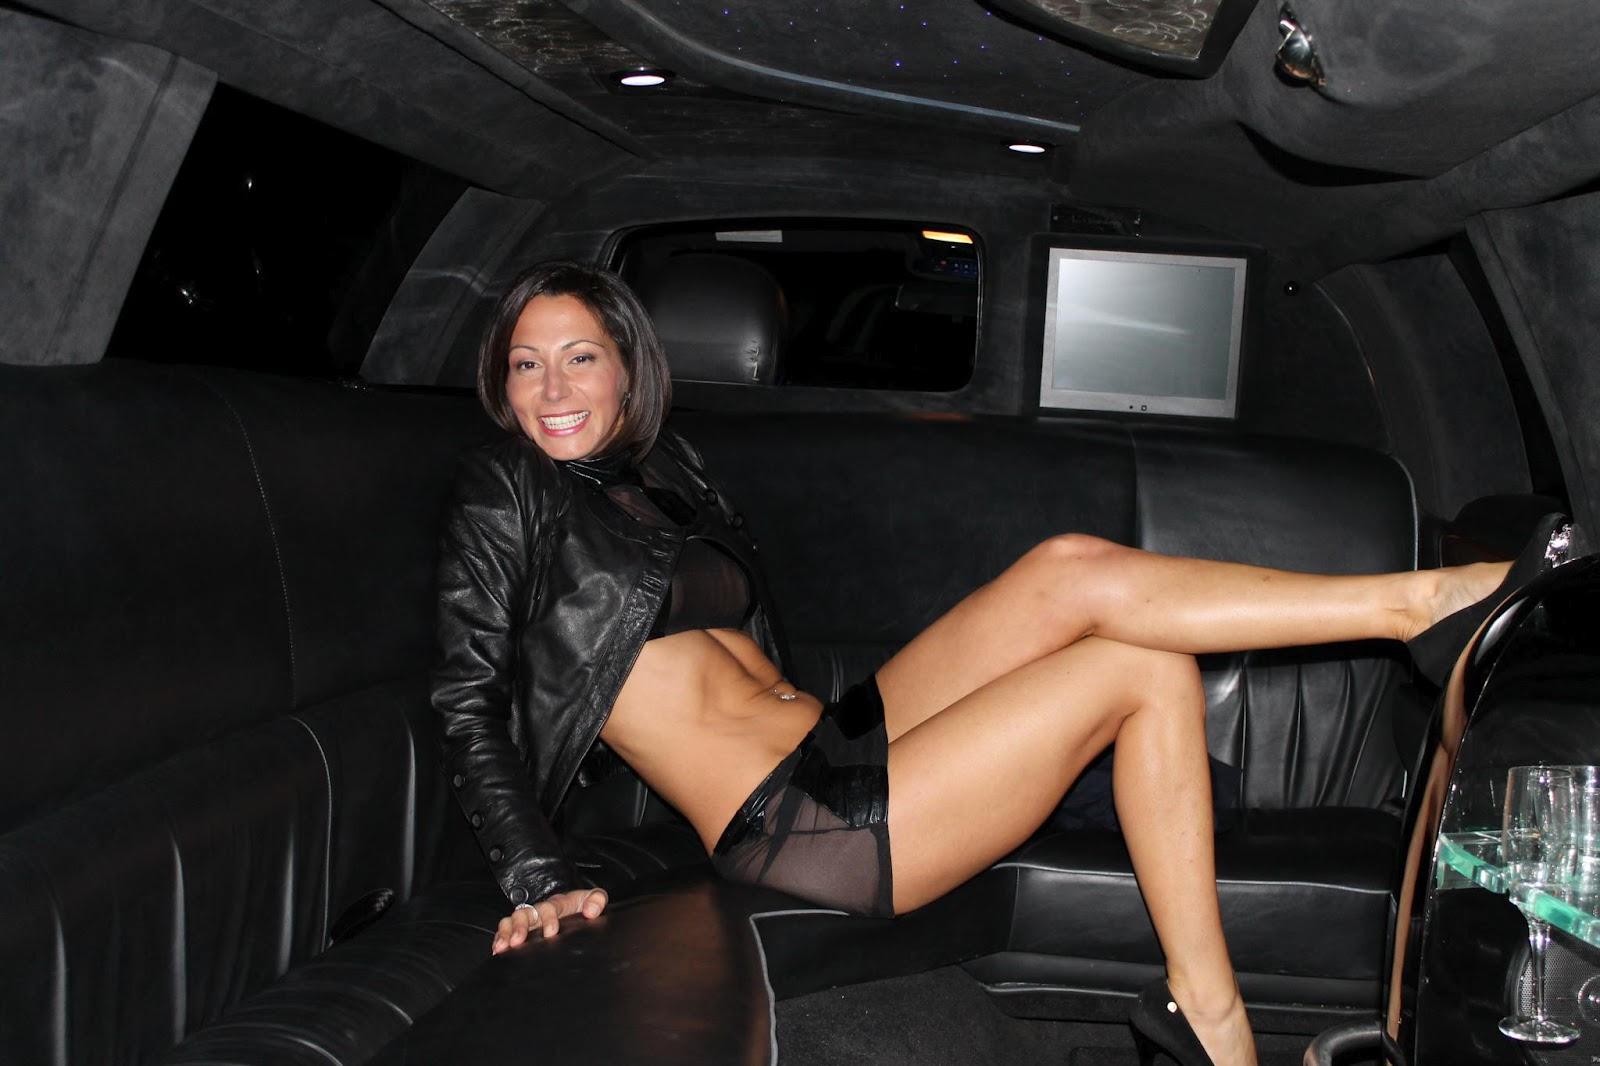 Nikki sims lesbian sex porncraft pic